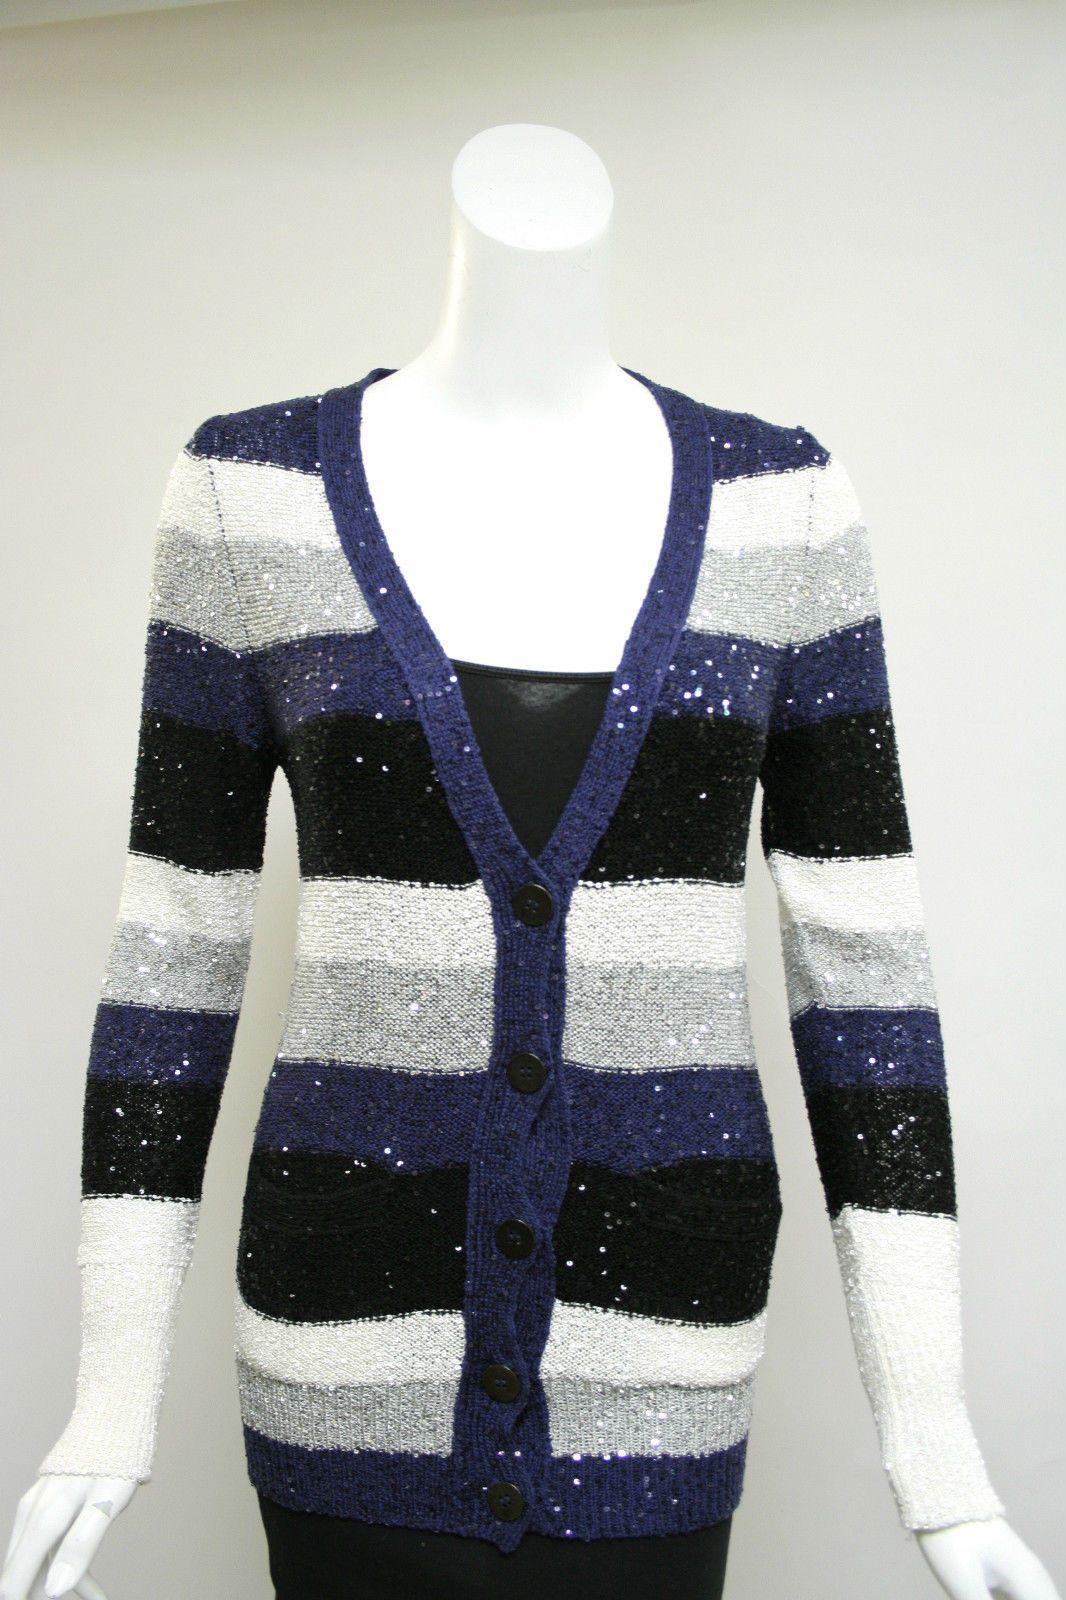 OSCAR DE LA RENTA Black/Blue/Silver/White Sequined Silk-Blend Knit ...